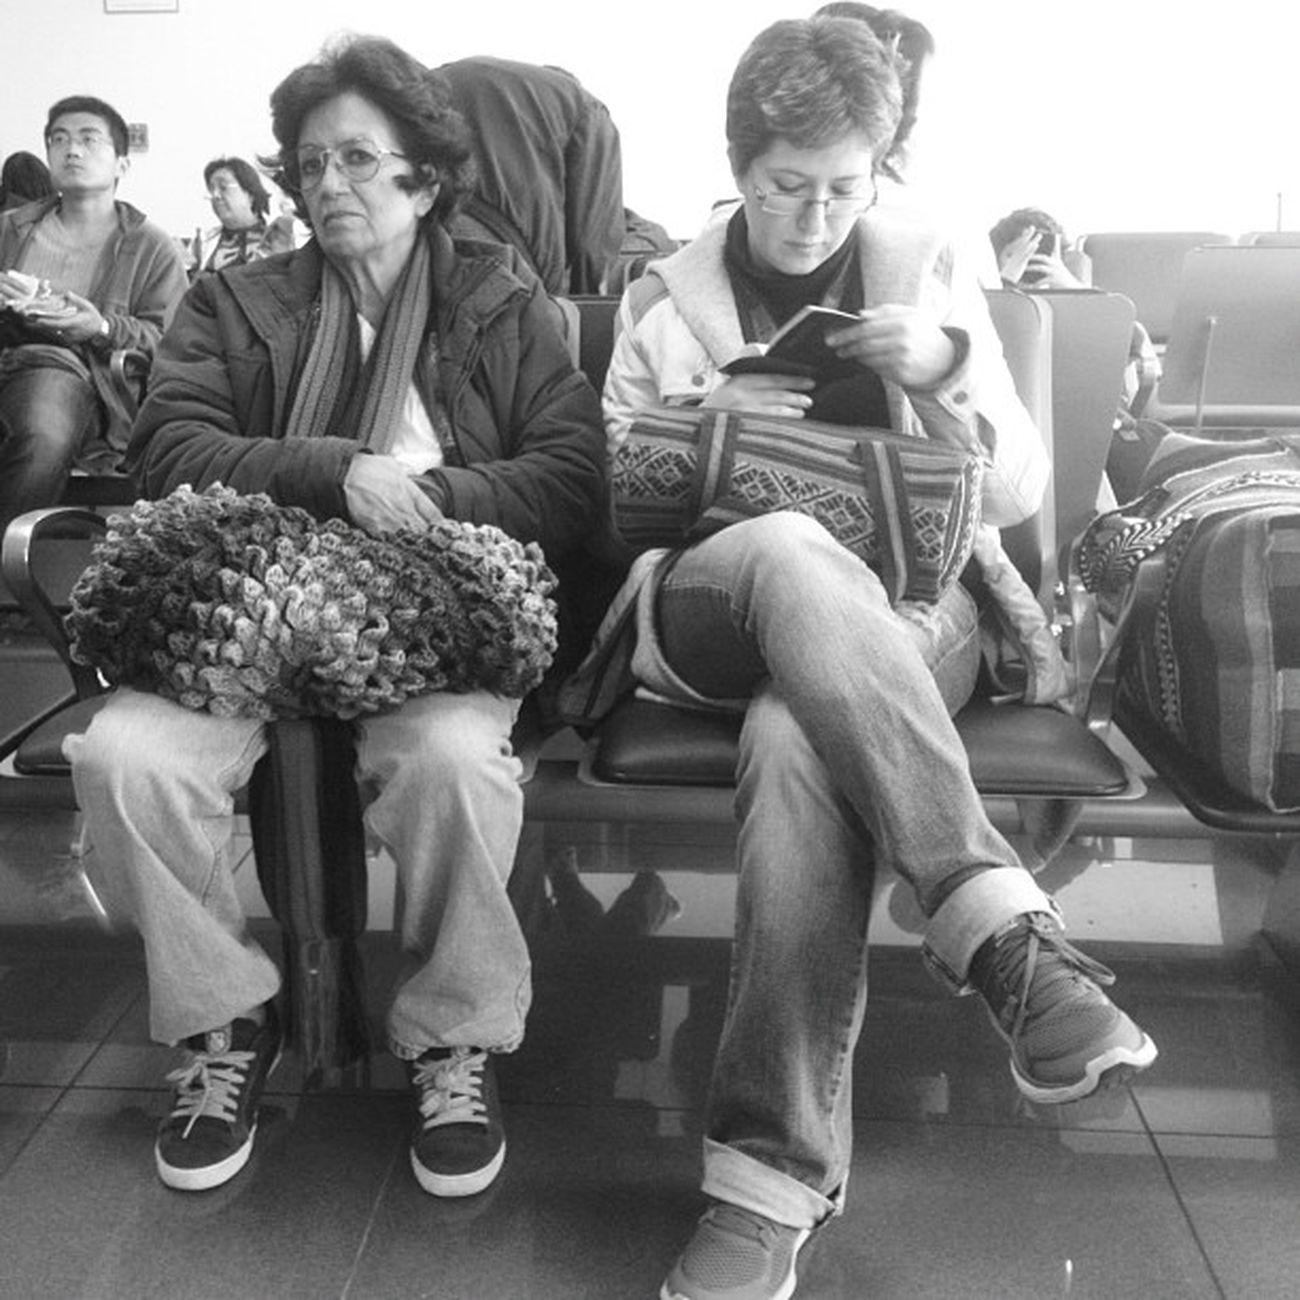 esperas y escalas... #peru Followback TBT  Instamood Buenosaires FotoDelDia Igers IGDaily Instagood IPhone Instagramhub Argentina Webstagram Iphoneonly Tweetgram Peru Mobilephoto Photooftheday Iphonegraphy Instagram Bsasmobilephoto Picoftheday Culturabaires Popckorn Coolturabsas